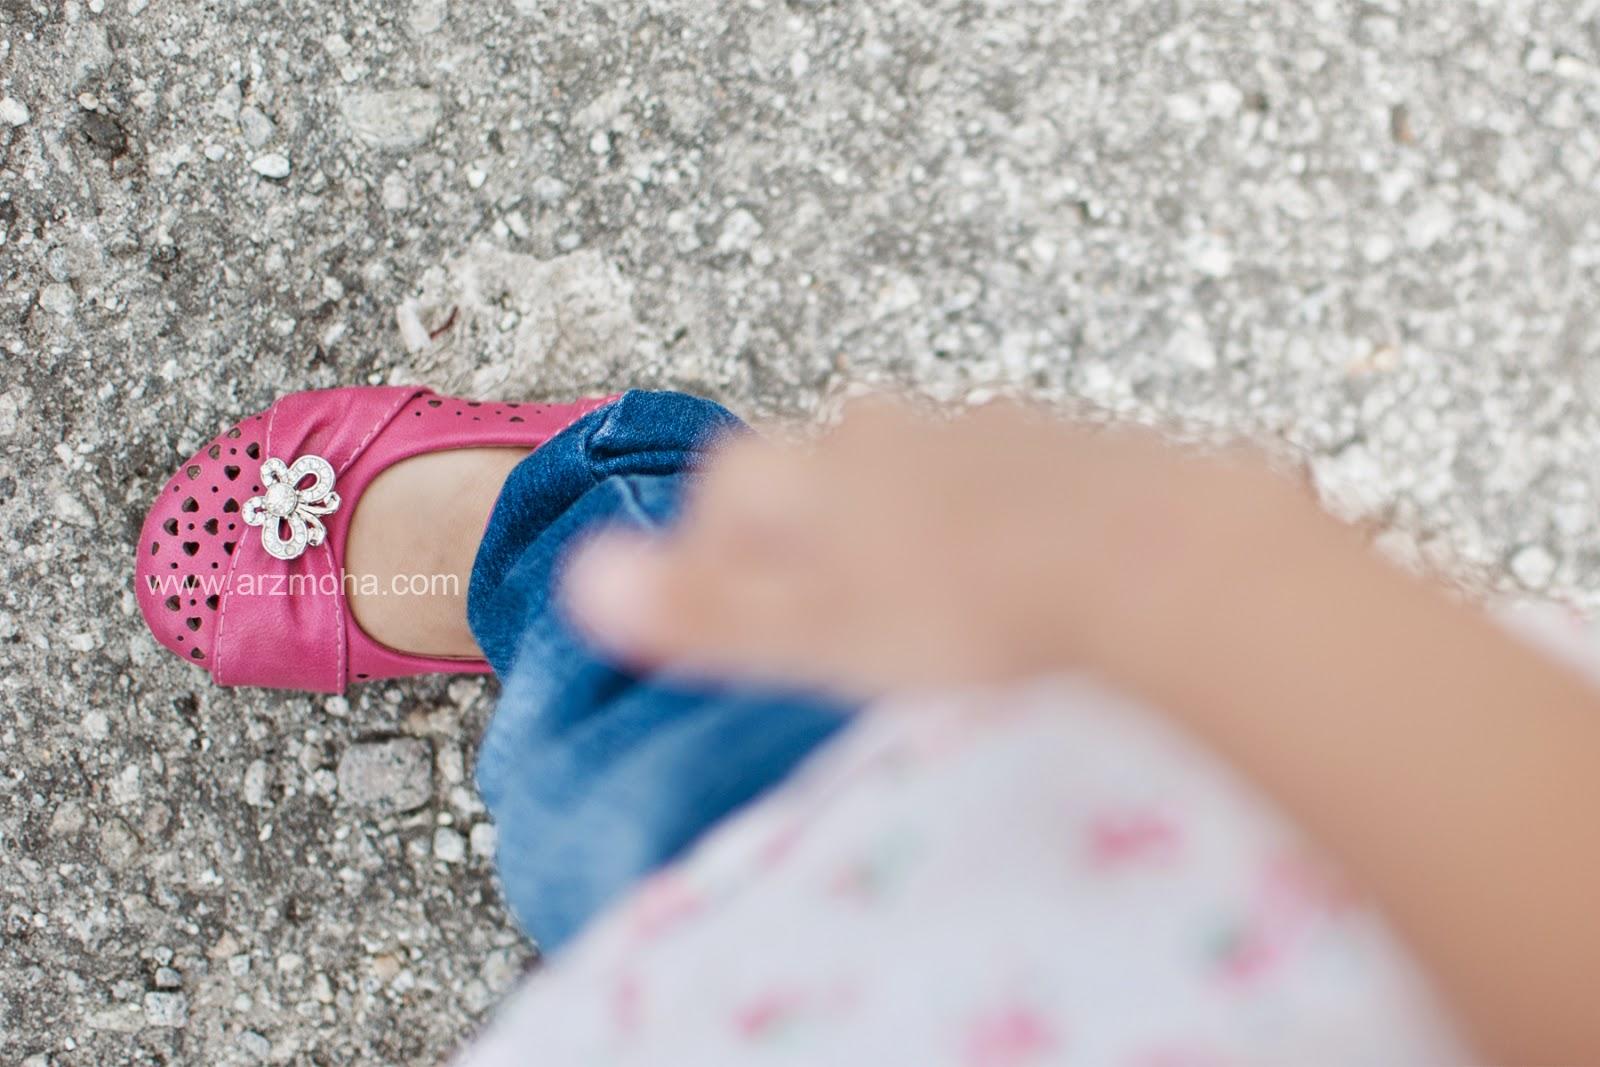 Cik Puteri, almira faqihah, shoes, girl, kids, kaki, foot, gambar cantik,